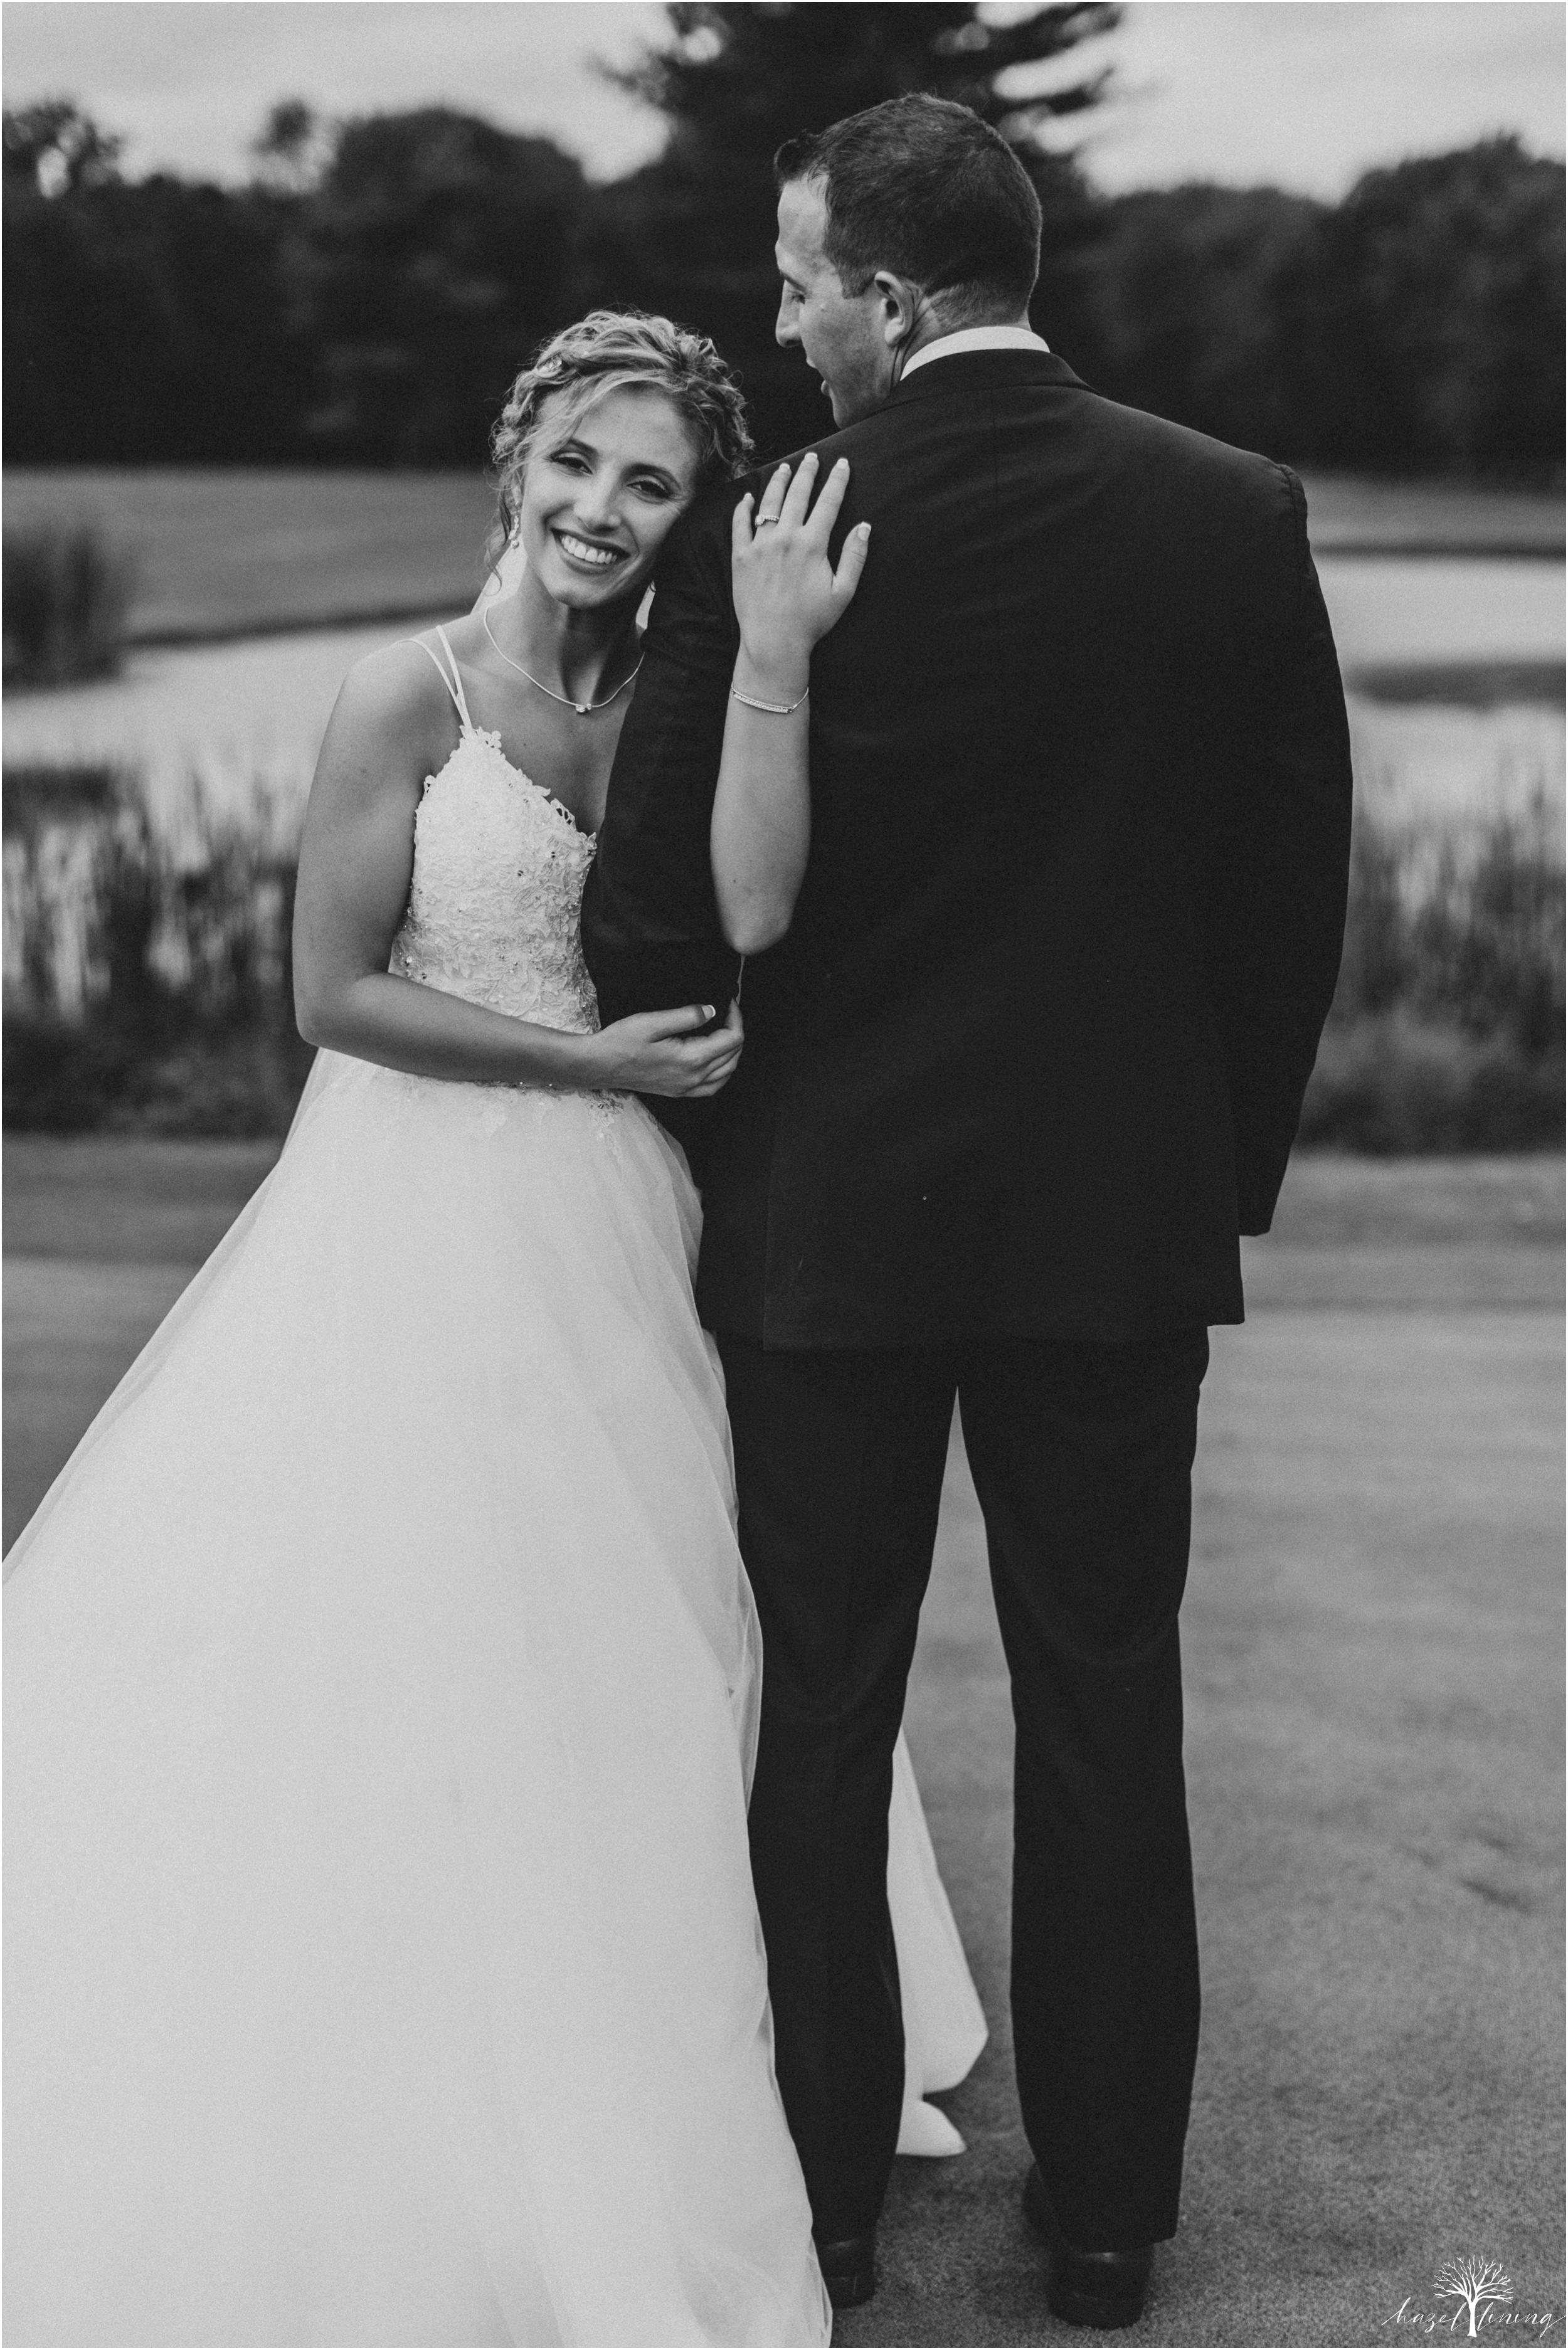 jonathan-weibel-becky-haywood-loft-at-sweetwater-cc-pennsburg-pennsylvania-rainy-day-summer-wedding-hazel-lining-travel-wedding-elopement-photography_0094.jpg